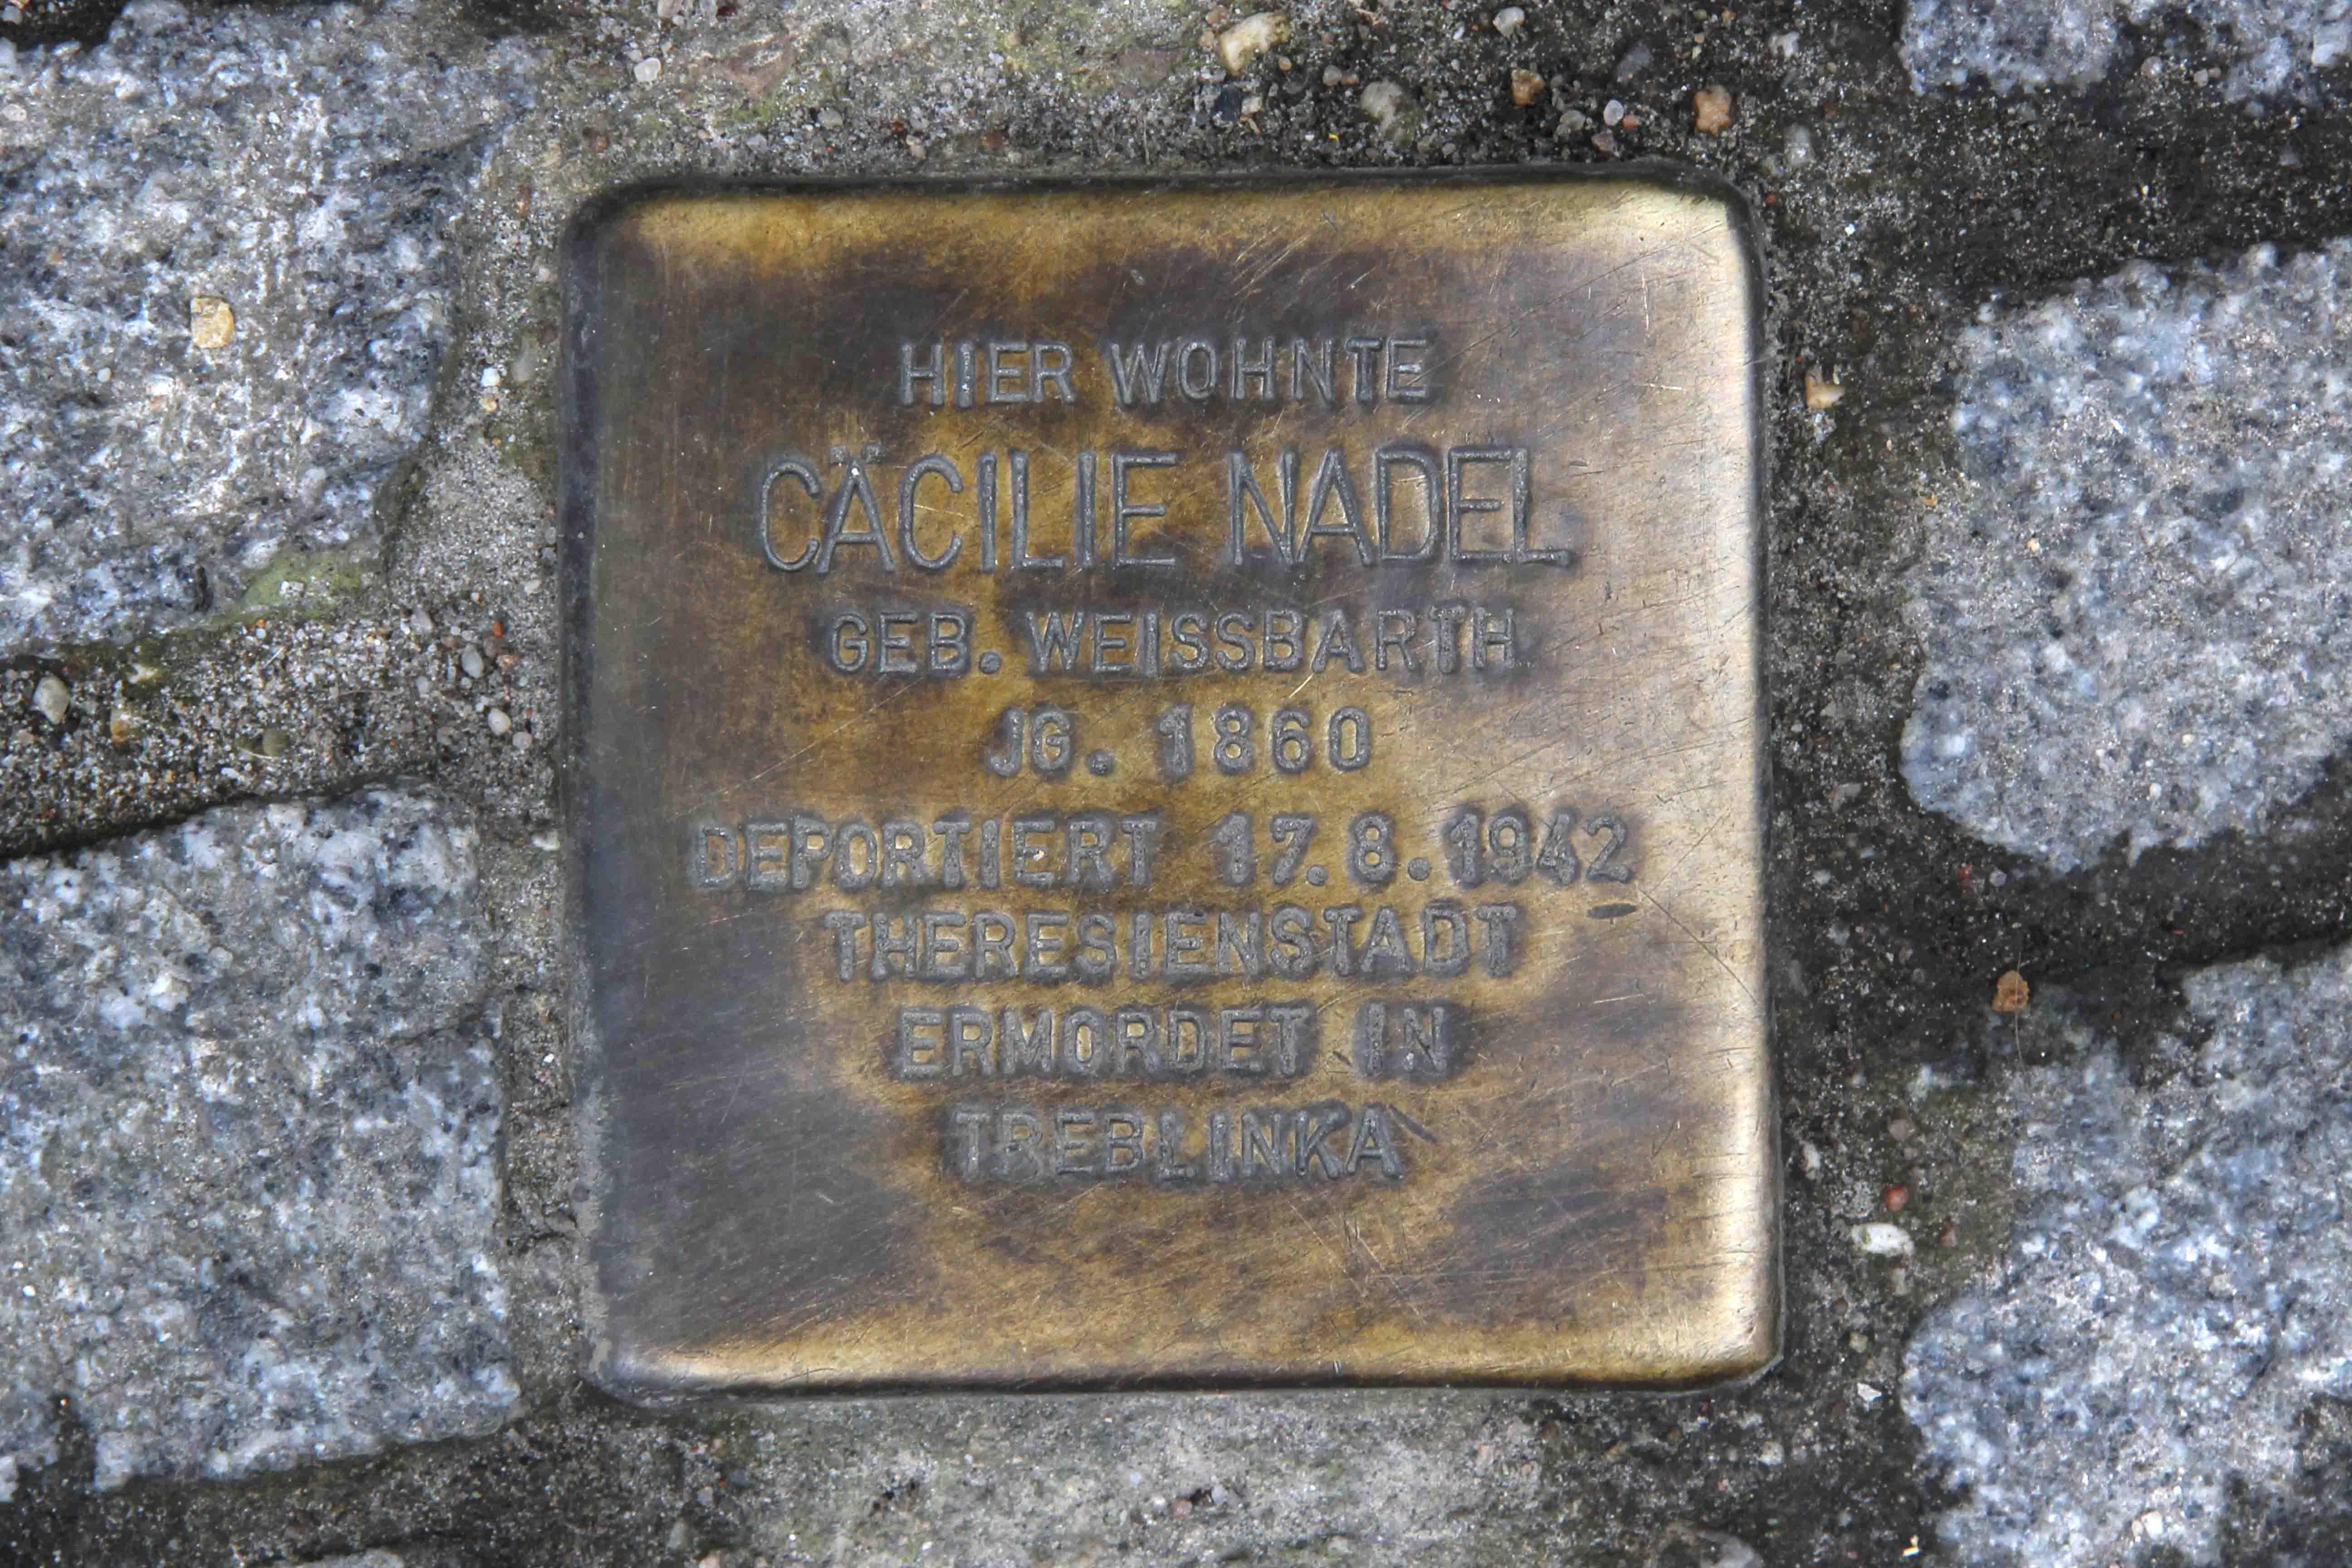 Stolpersteine Berlin 195: In memory of Cacilie Nadel (Admiralstrasse 23)